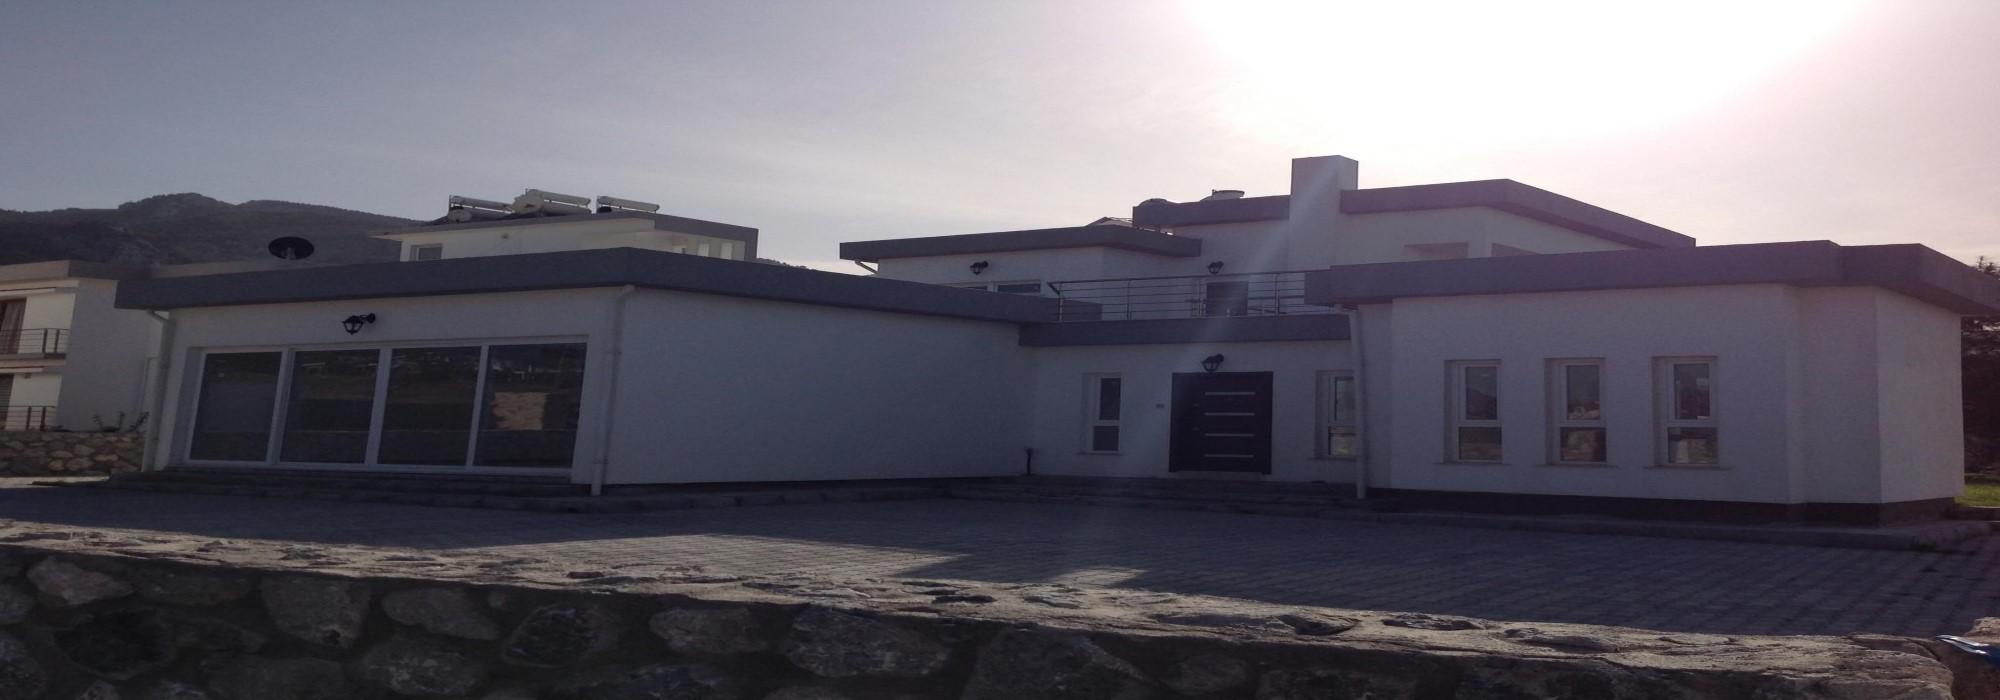 6 Bedroom Brandnew Villa For Sale Location Catalkoy Girne